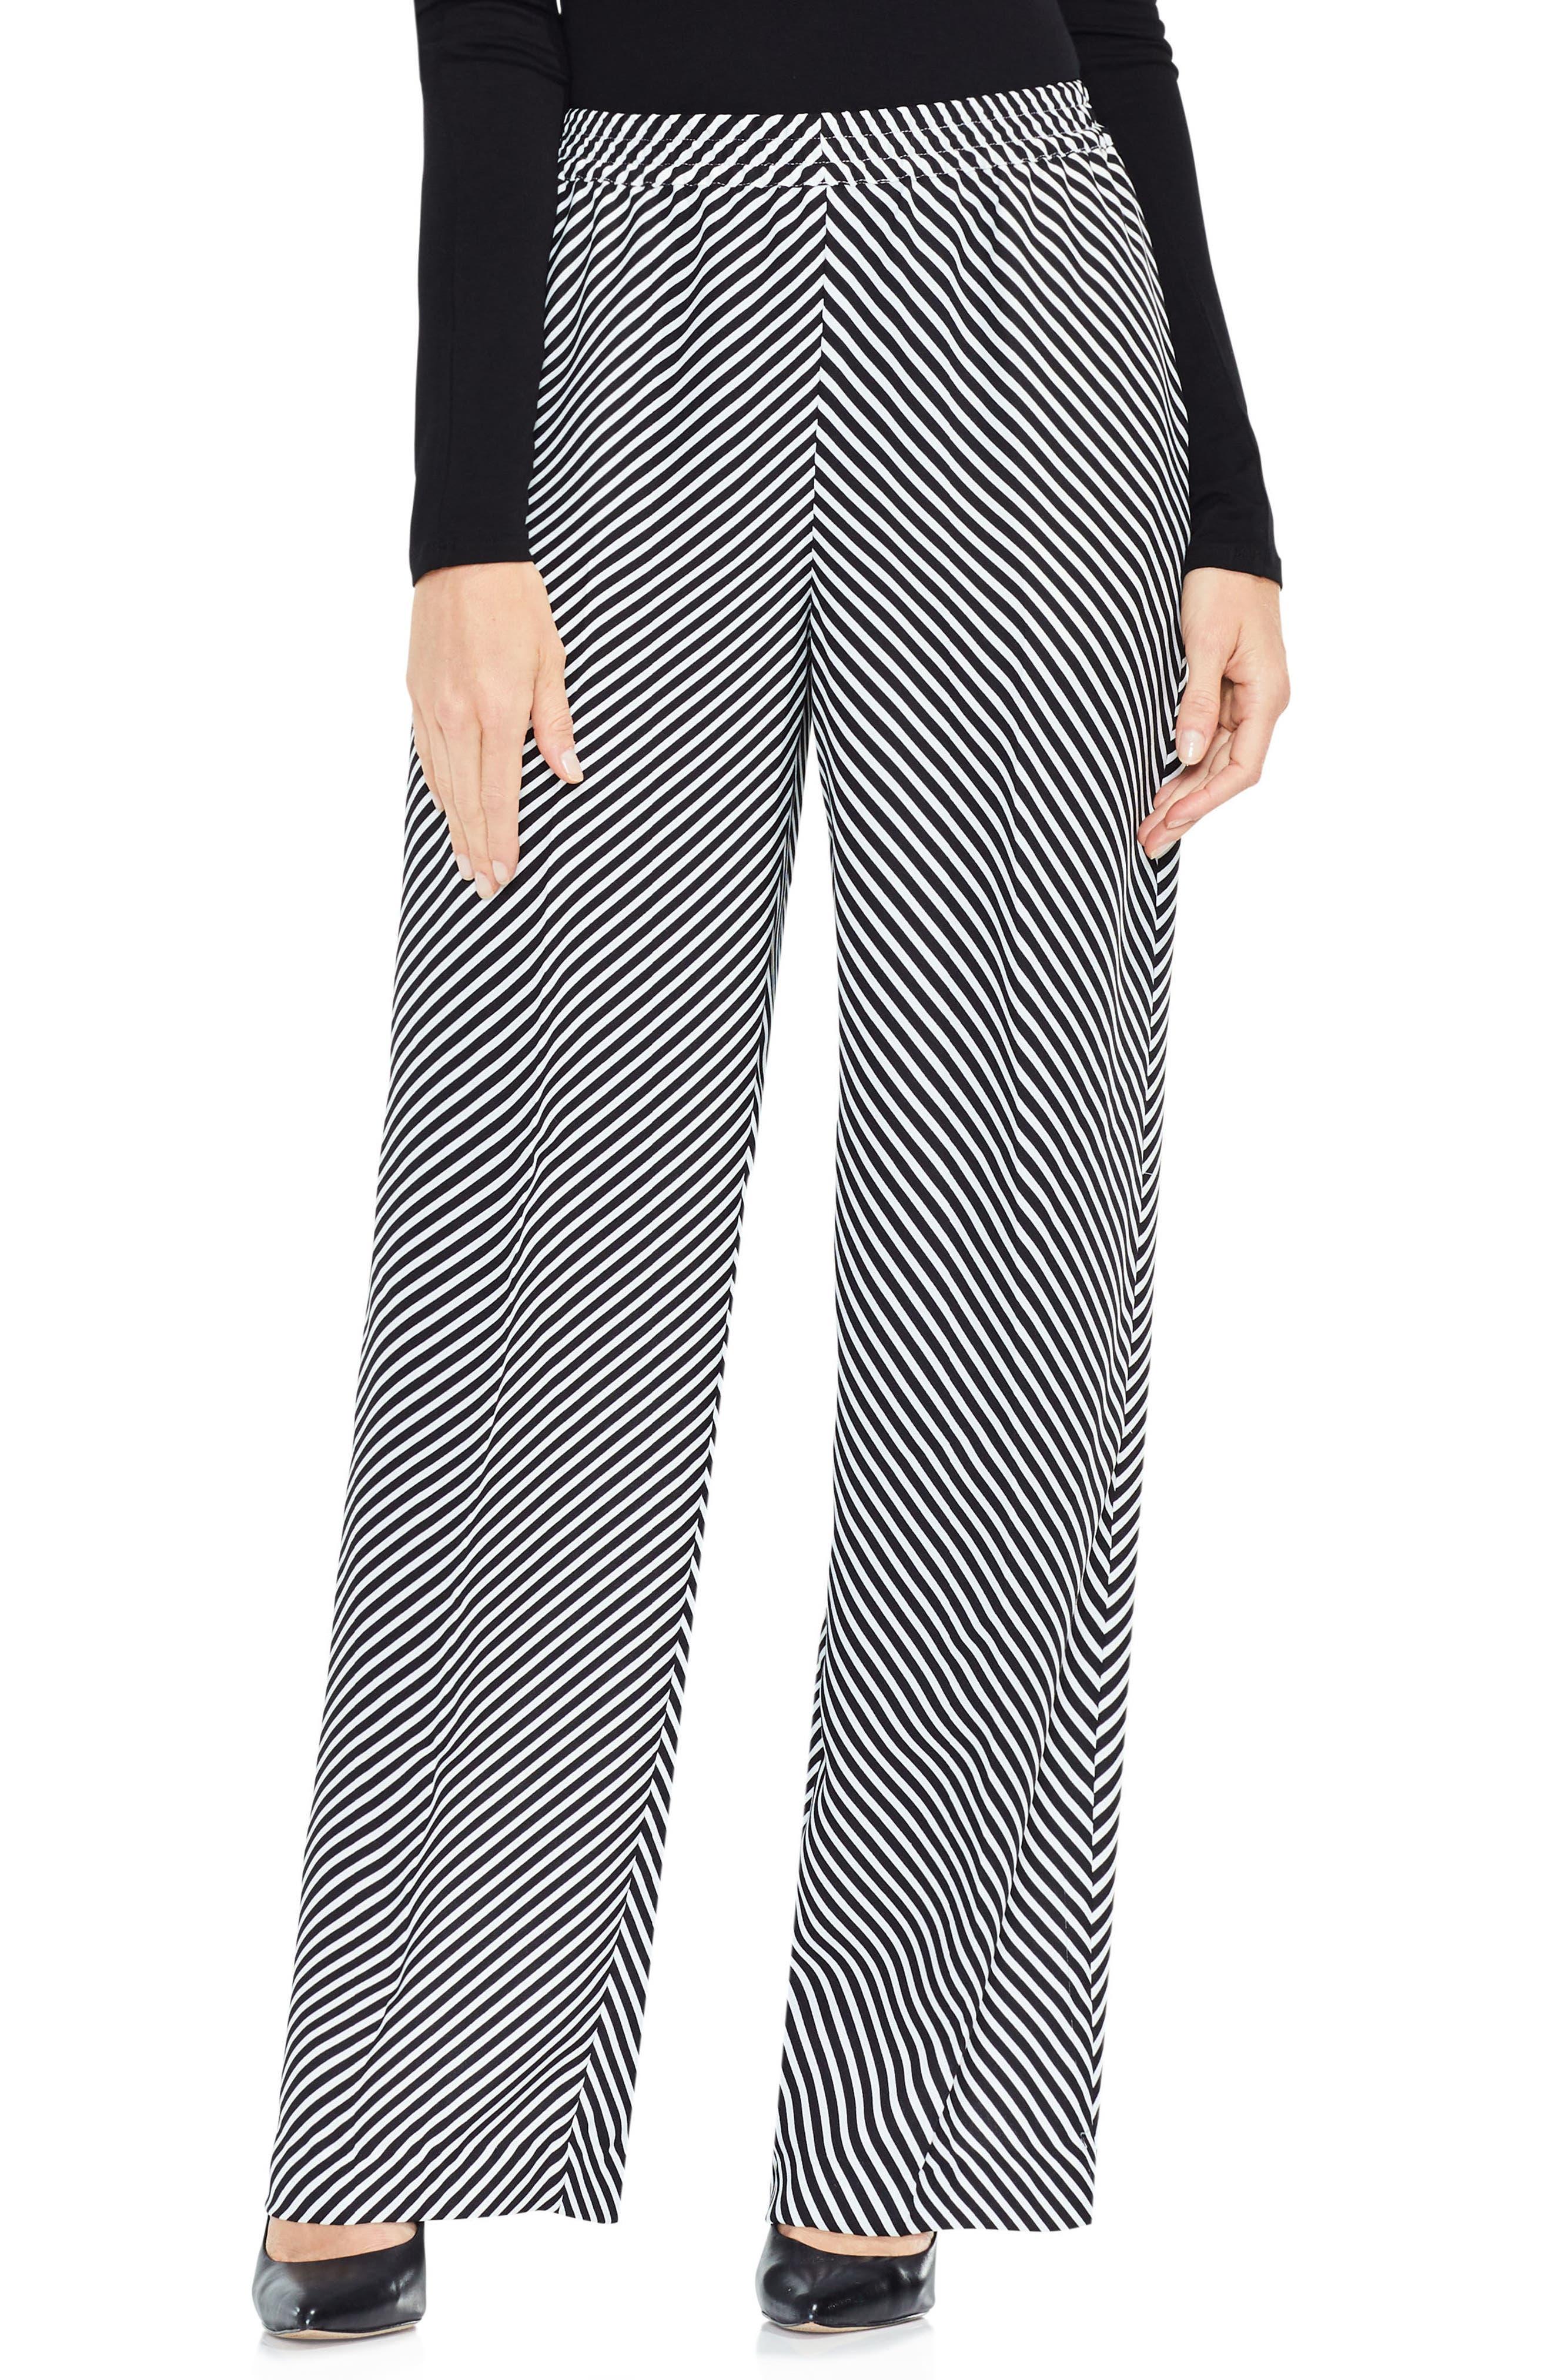 Alternate Image 1 Selected - Vince Camuto Diagonal Stripe Wide Leg Pants